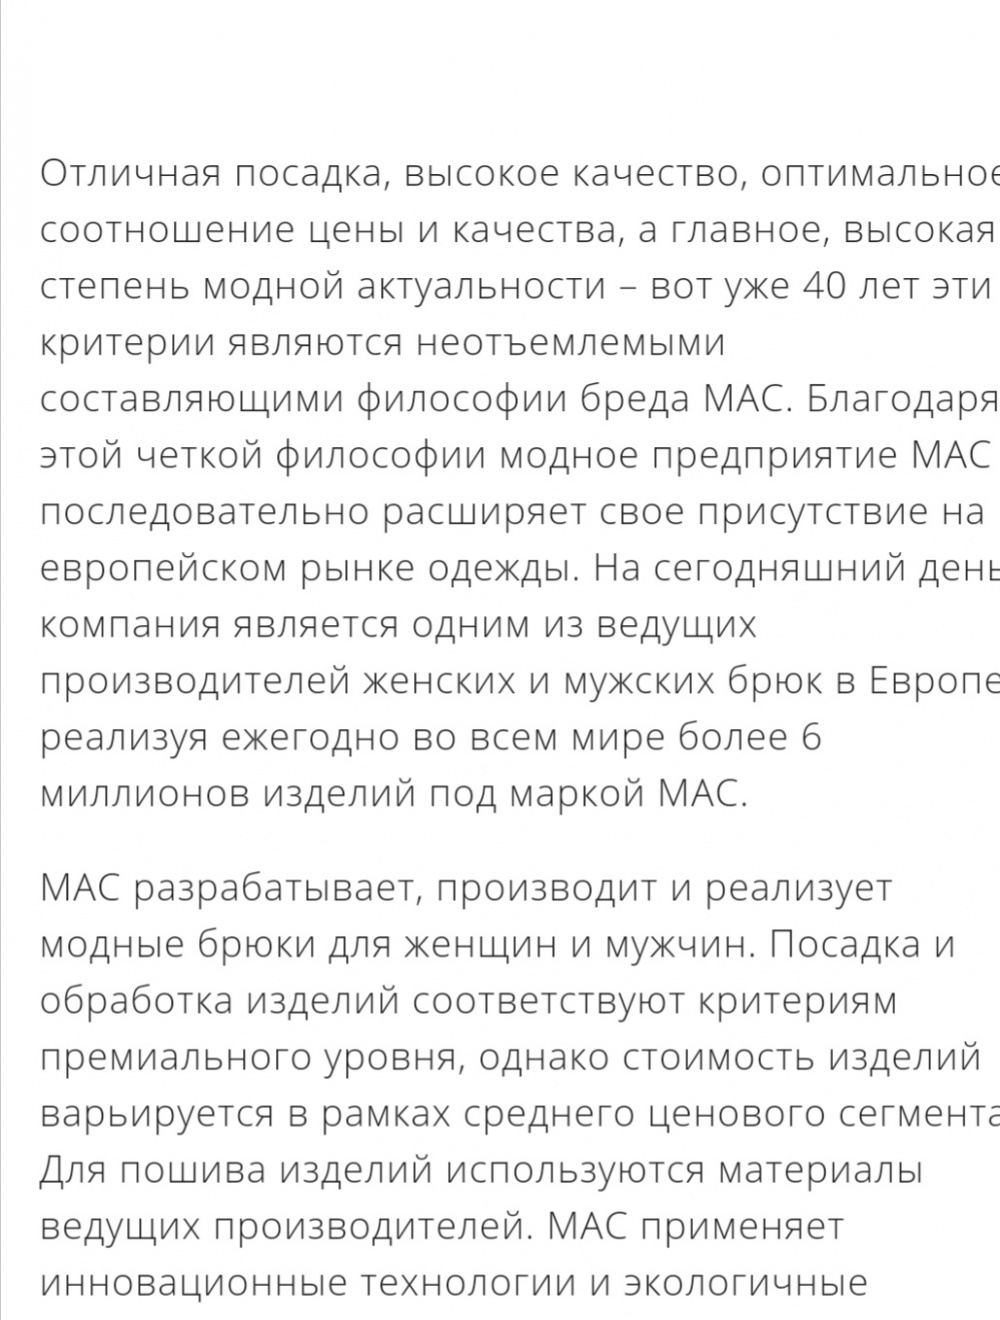 Брюки -Джоггеры Mac,44-46